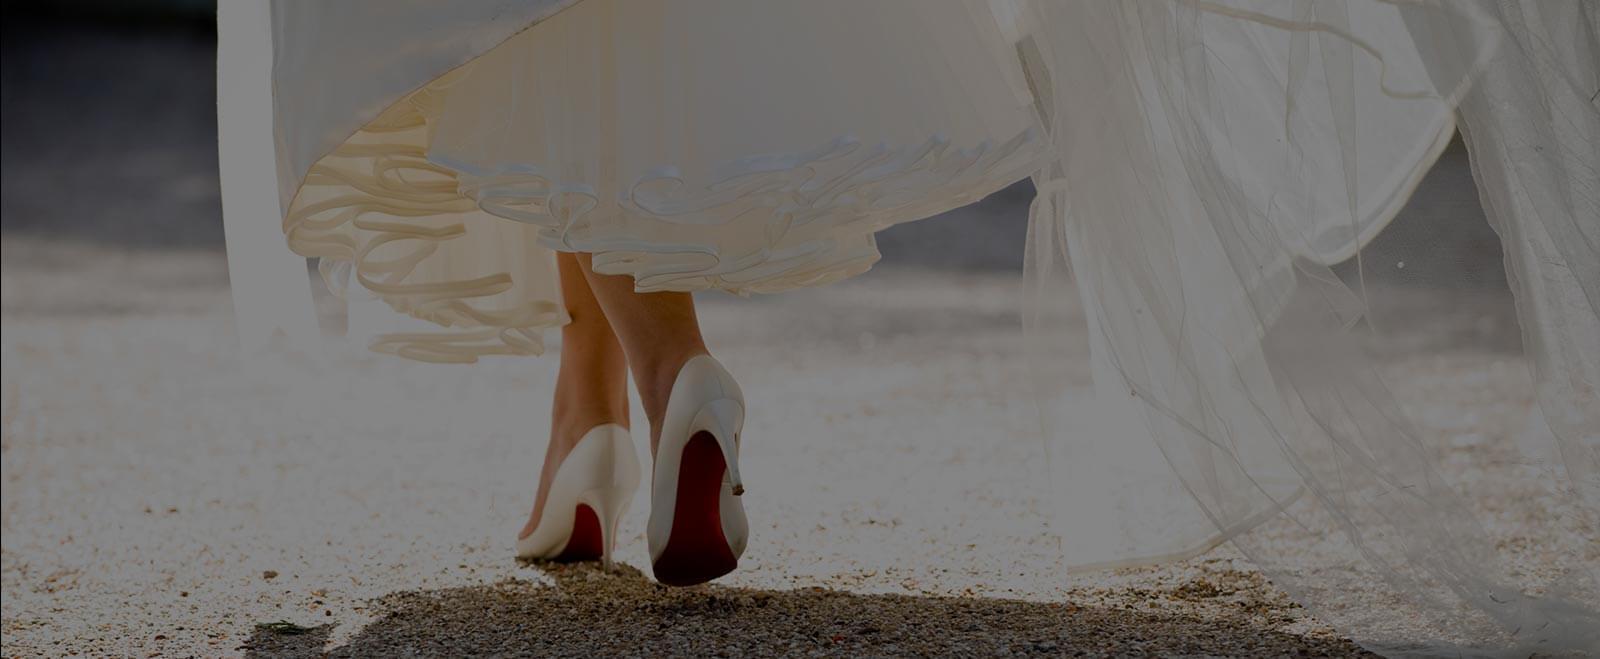 Luxury Wedding Design - Bride Ideas